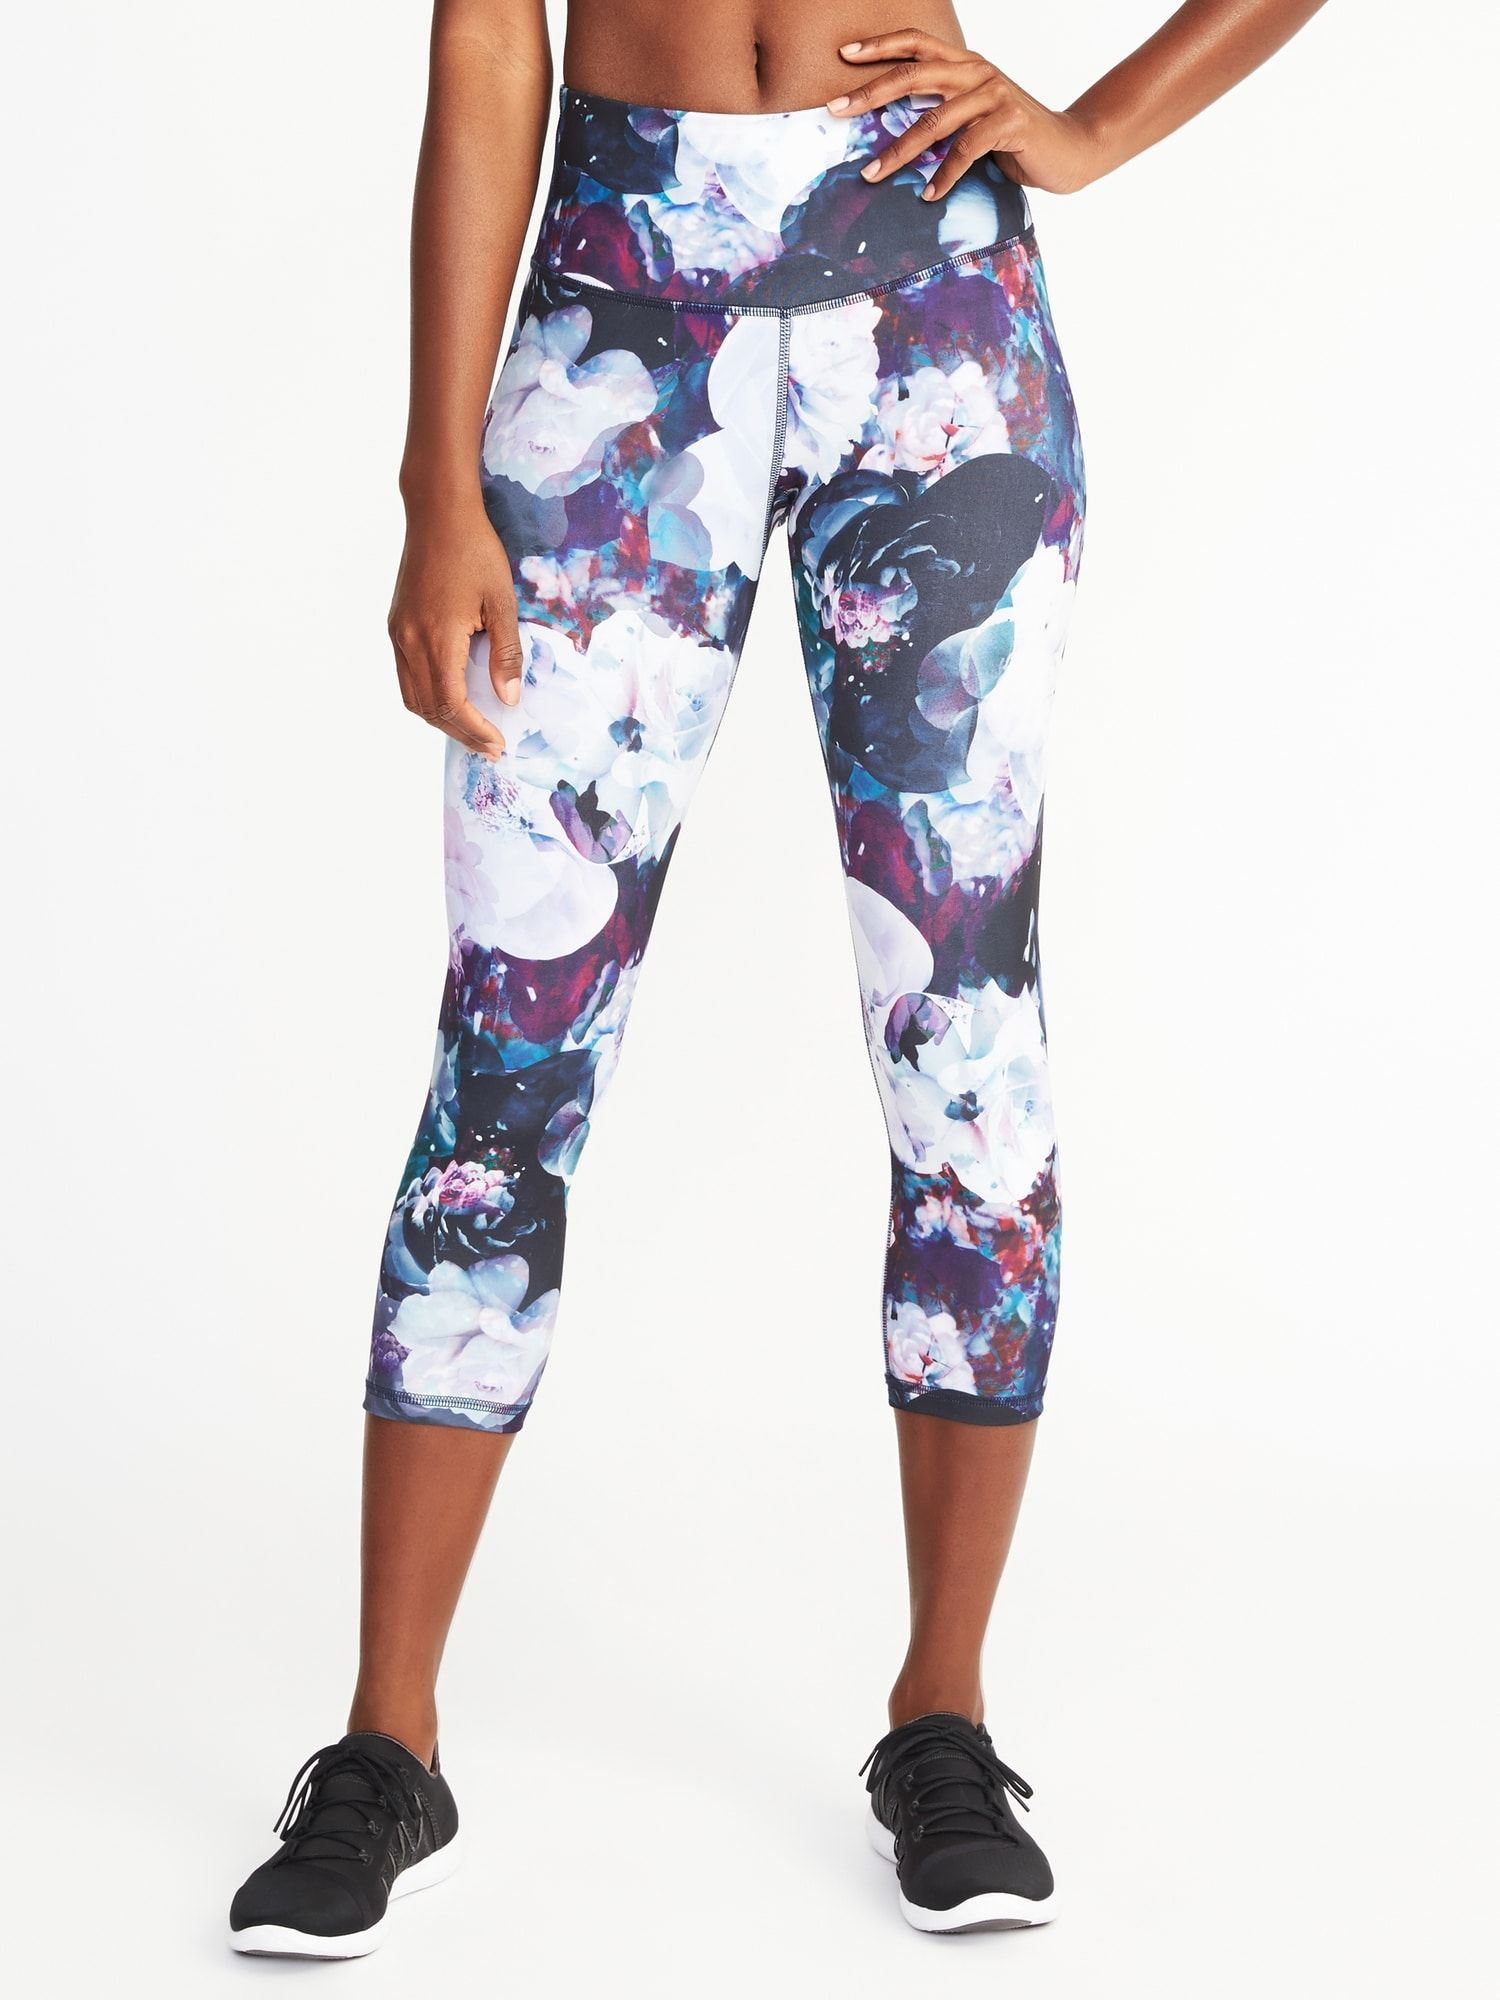 3868f061994e08 Medium Women's Leggings, Leggings Are Not Pants, Stylish Dresses, My Wish  List,